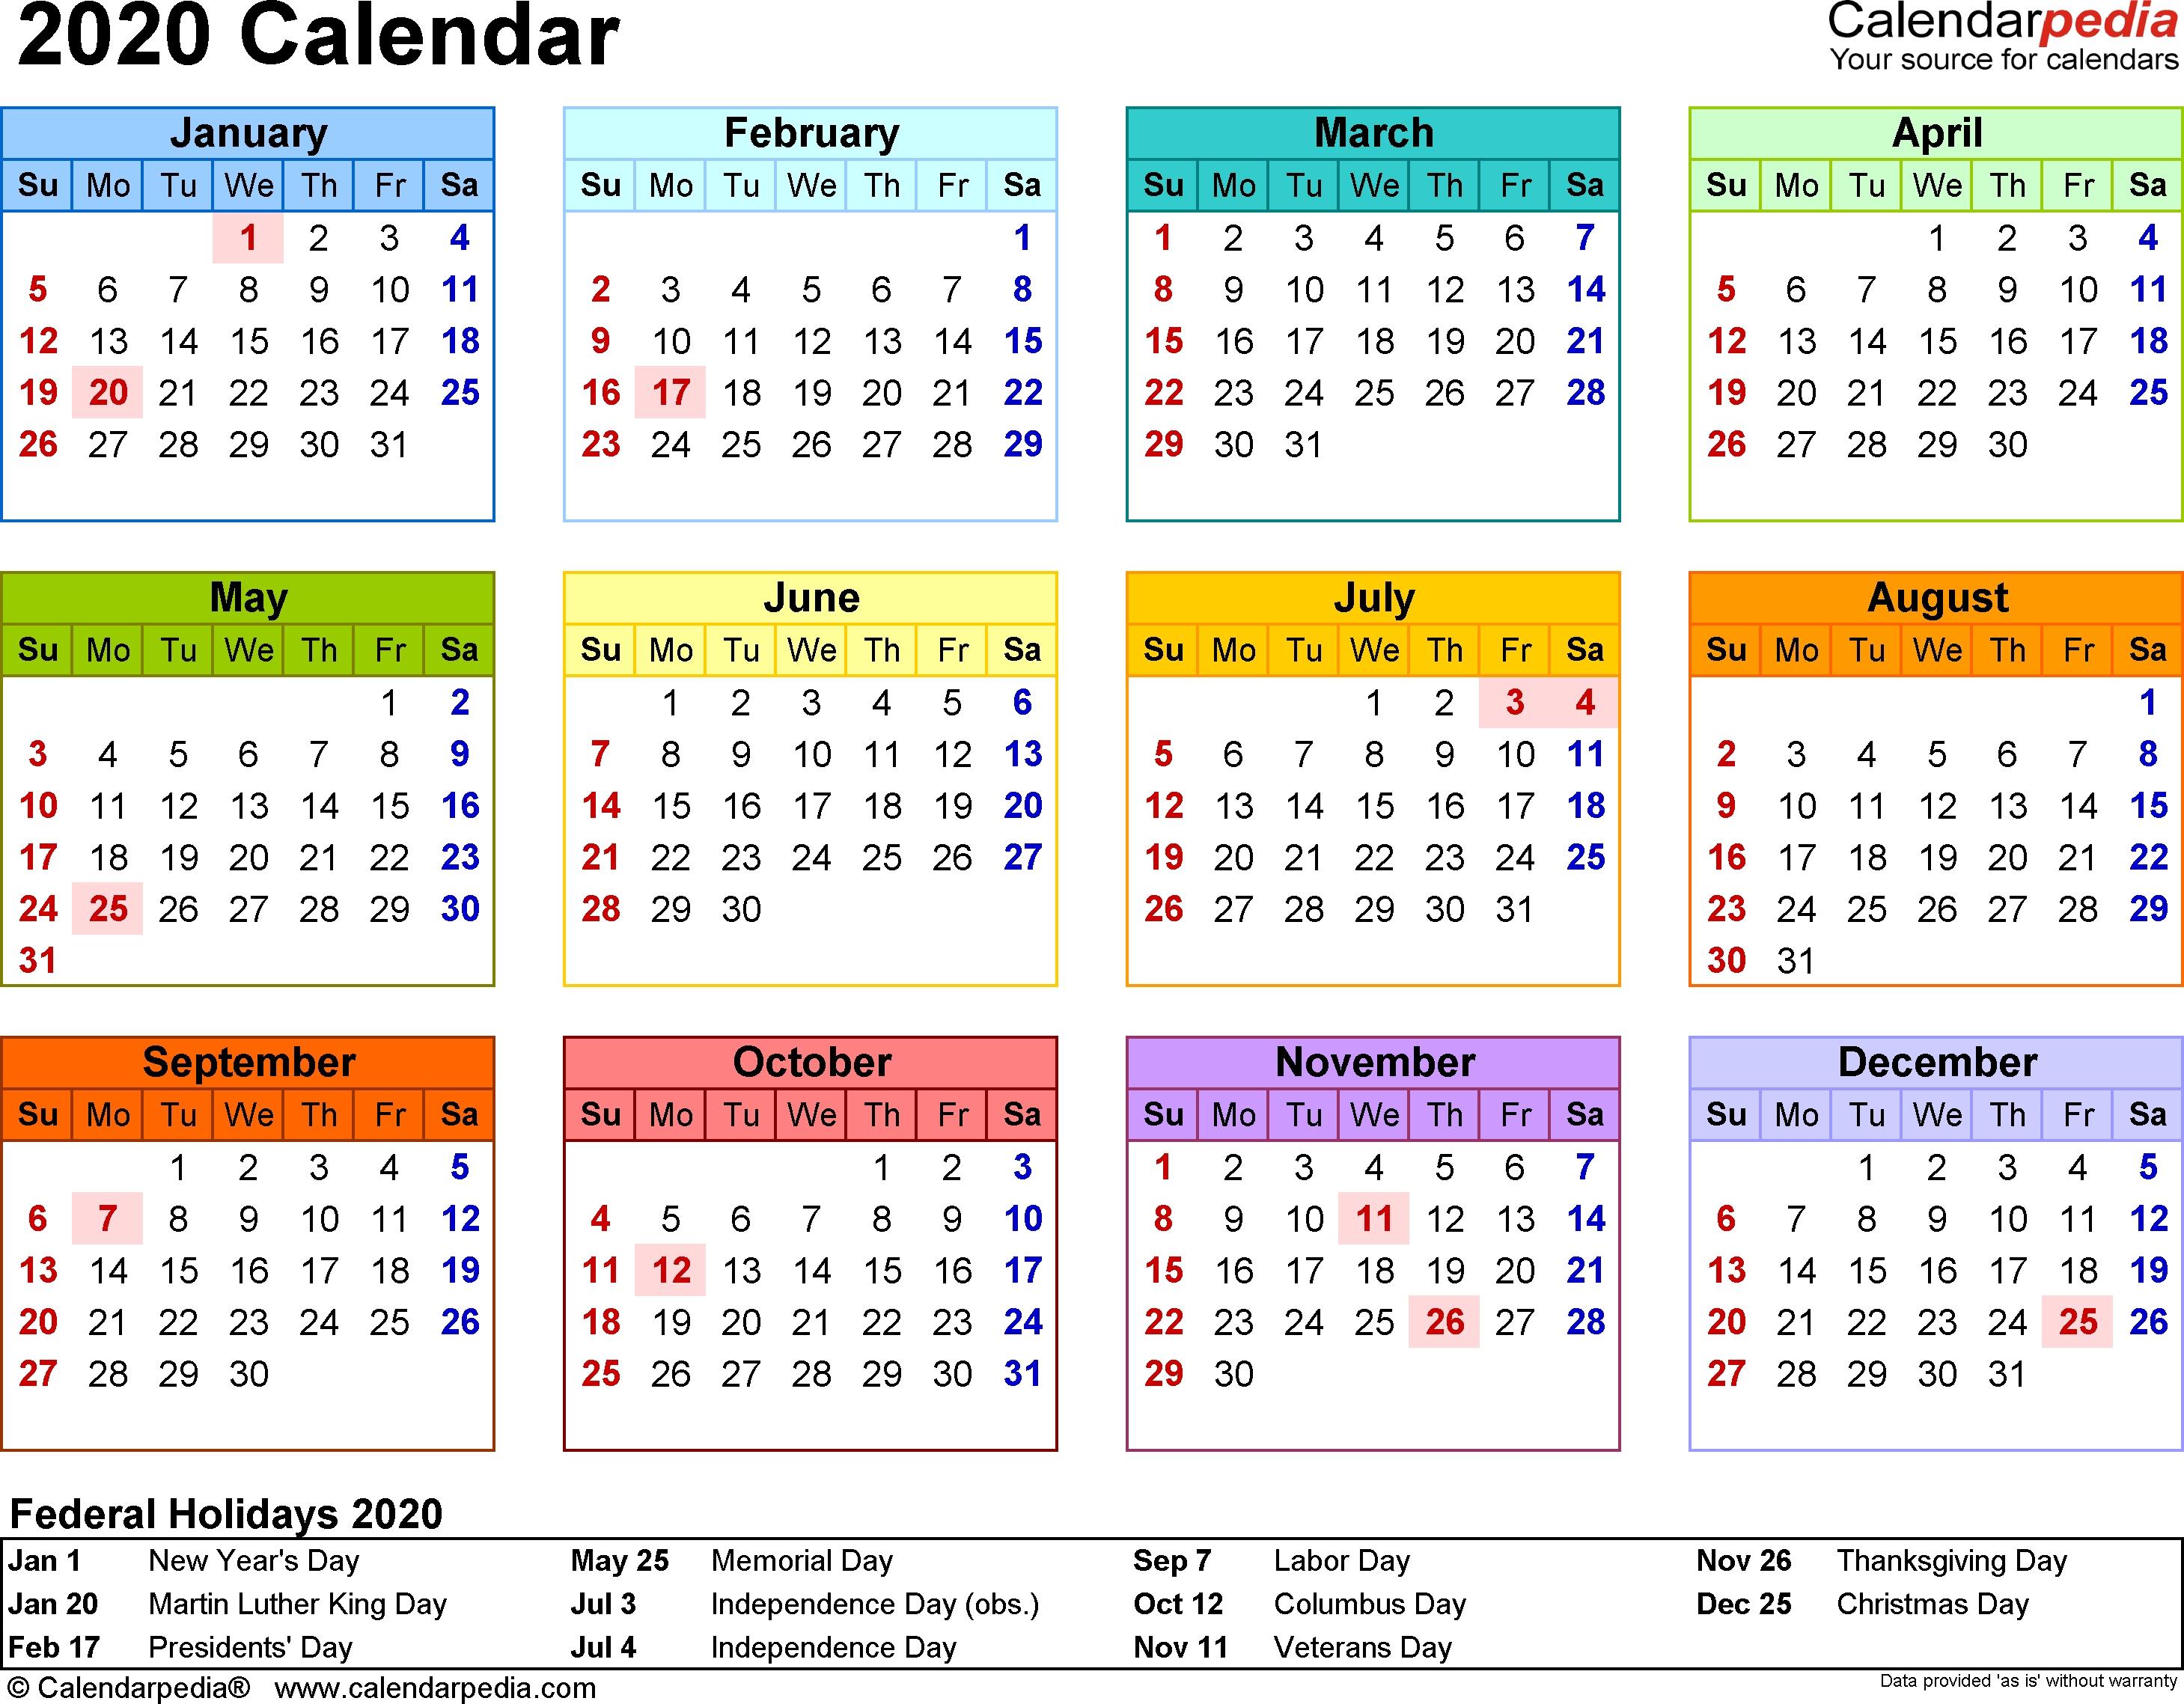 2020 Calendar - Download 18 Free Printable Excel Templates-Printable Employee Vacation Calendar 2020 Template